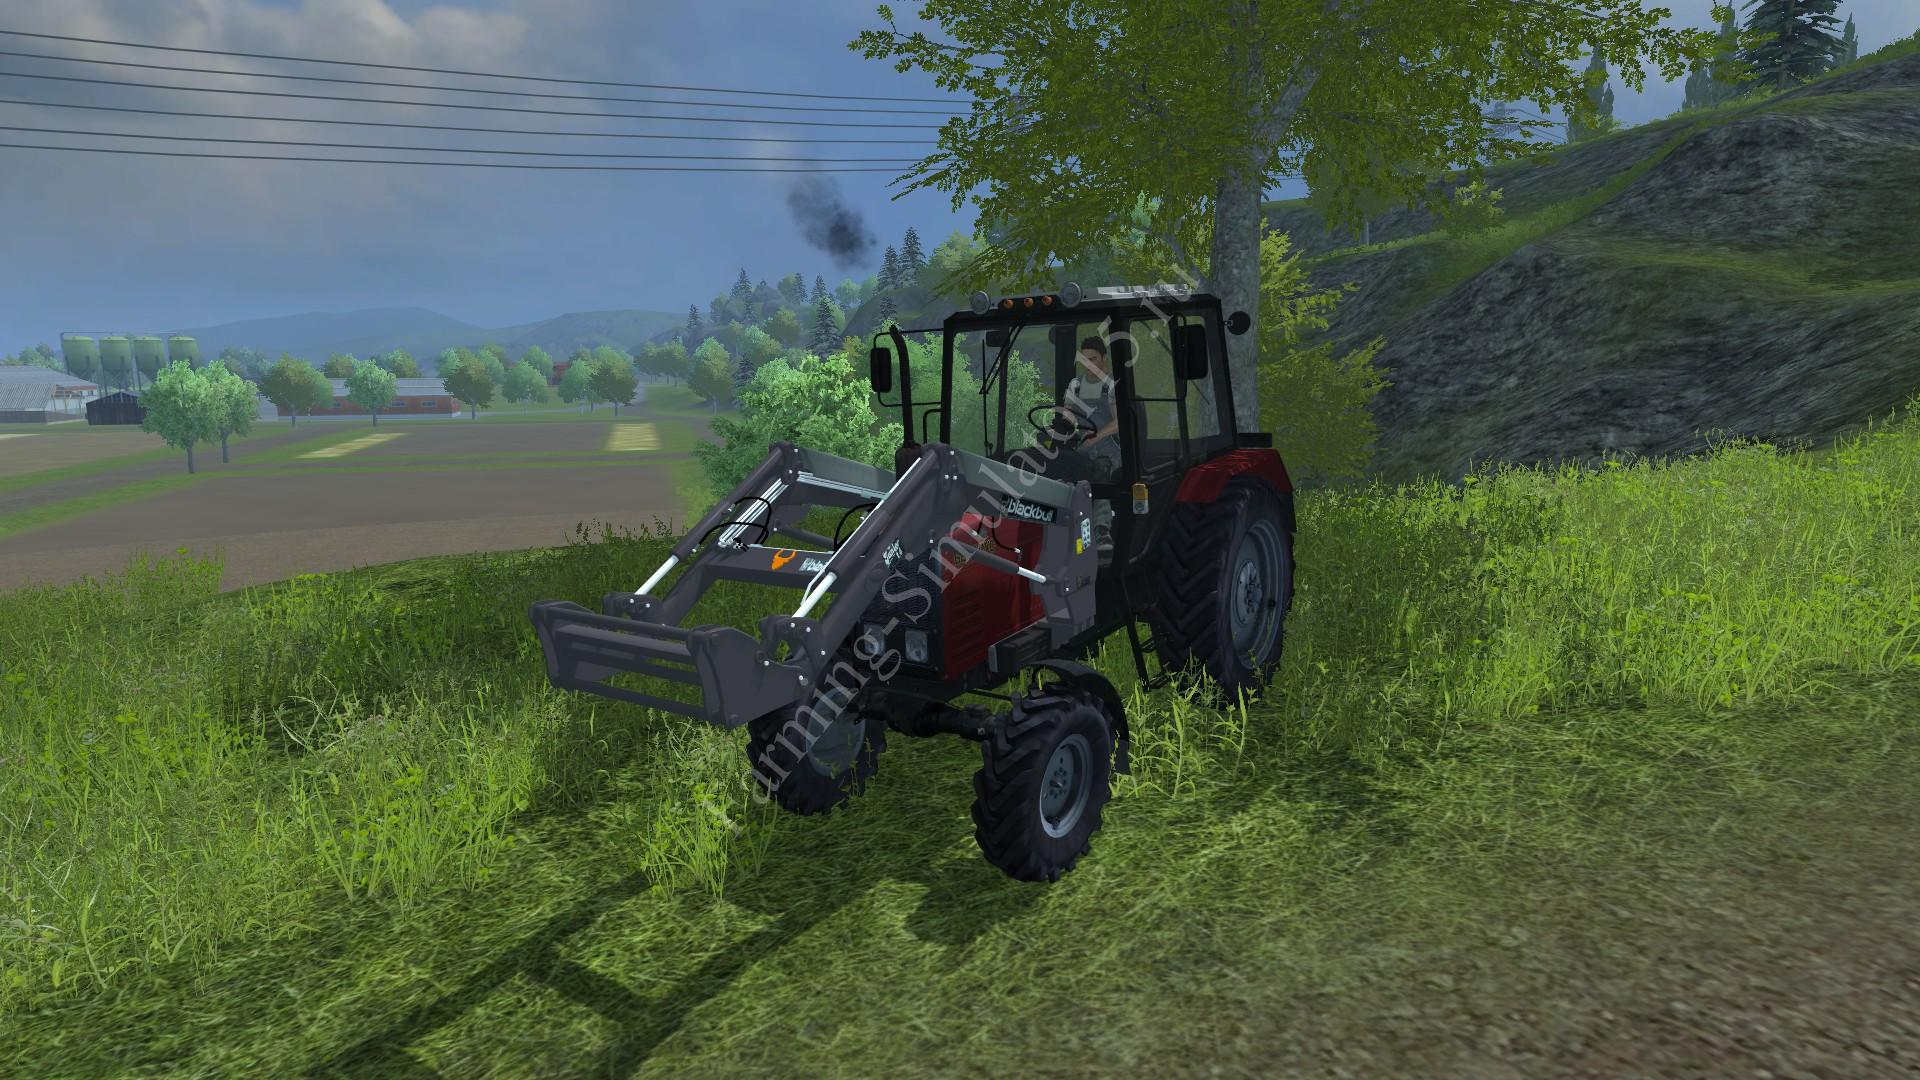 Мод трактора MTZ 920 FL v 1.0 Farming Simulator 2013, Farming Simulator 13